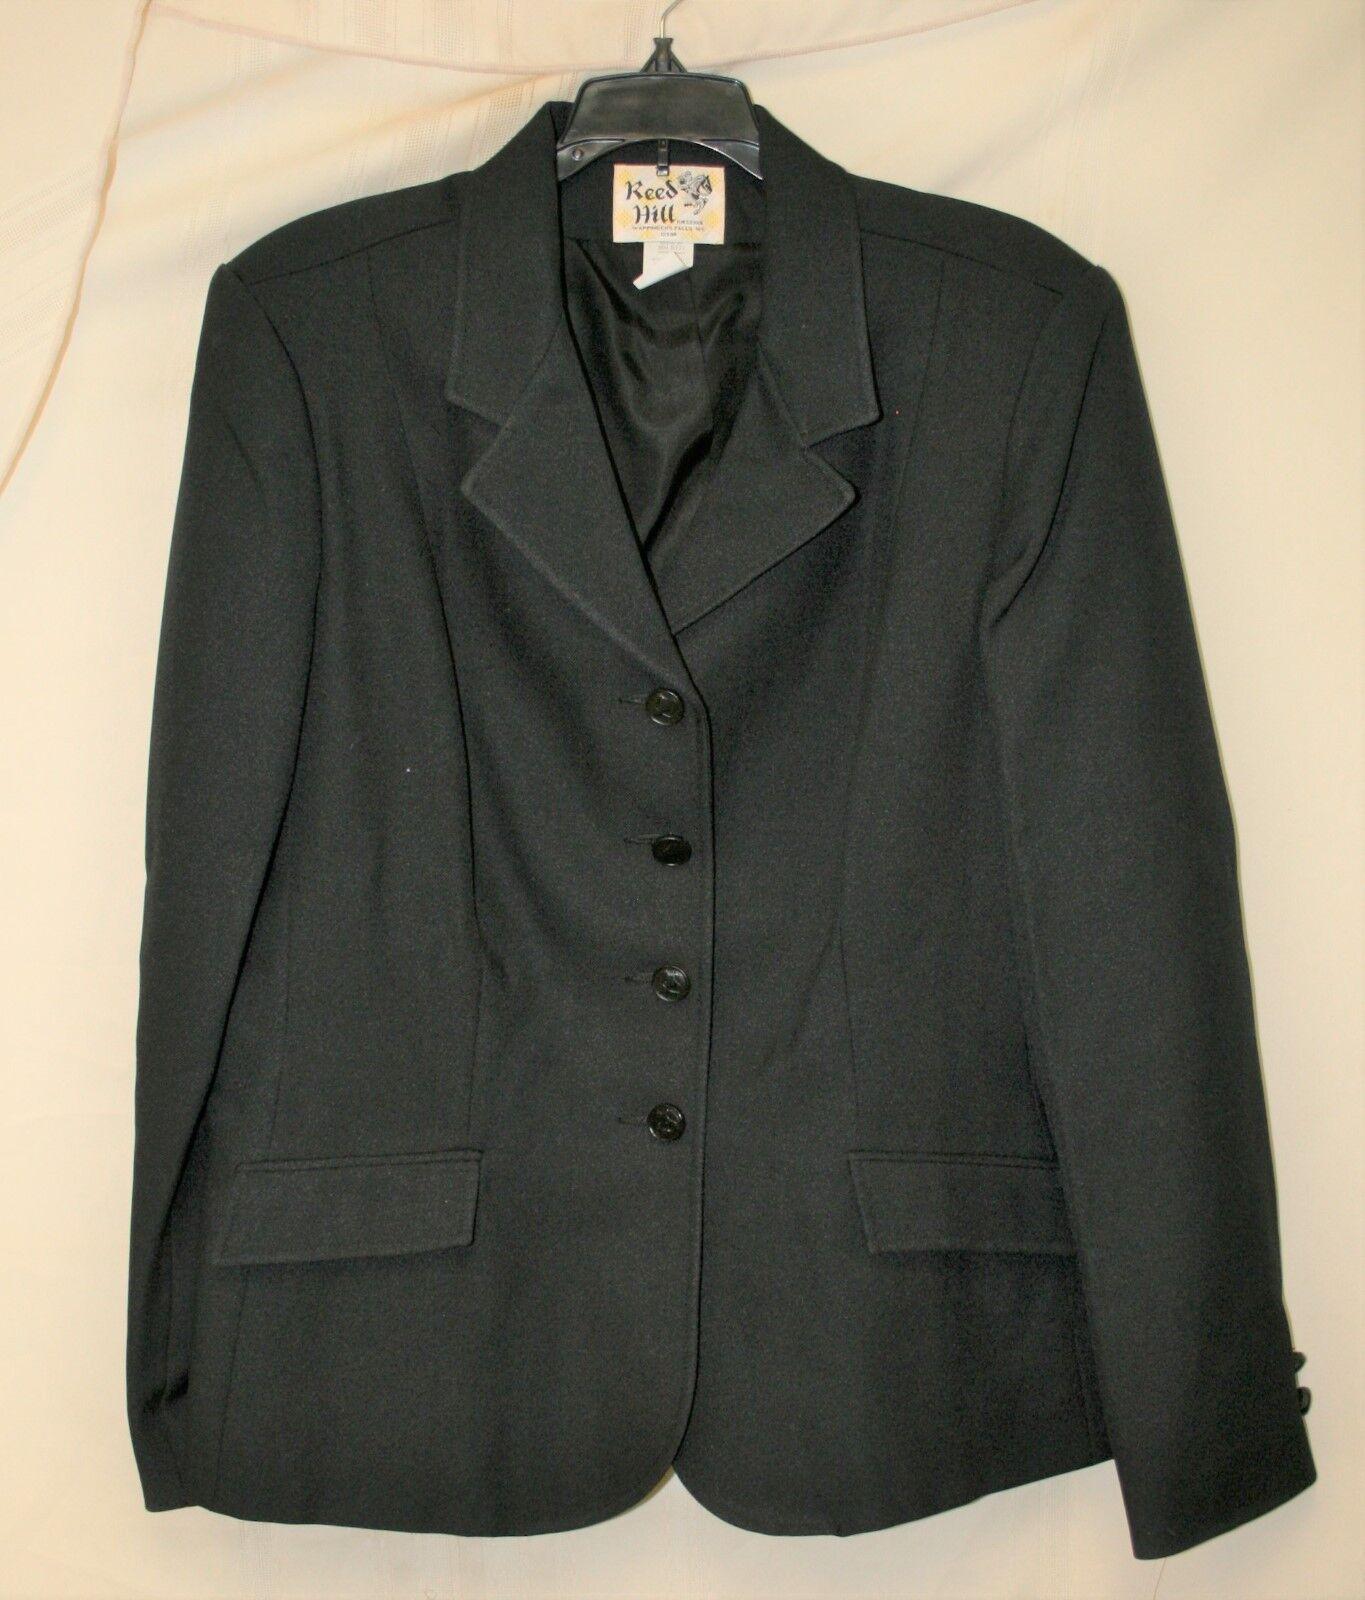 Nuevas Damas Abrigo De Doma mostrar Reed HILL-tamaño 20, Negro